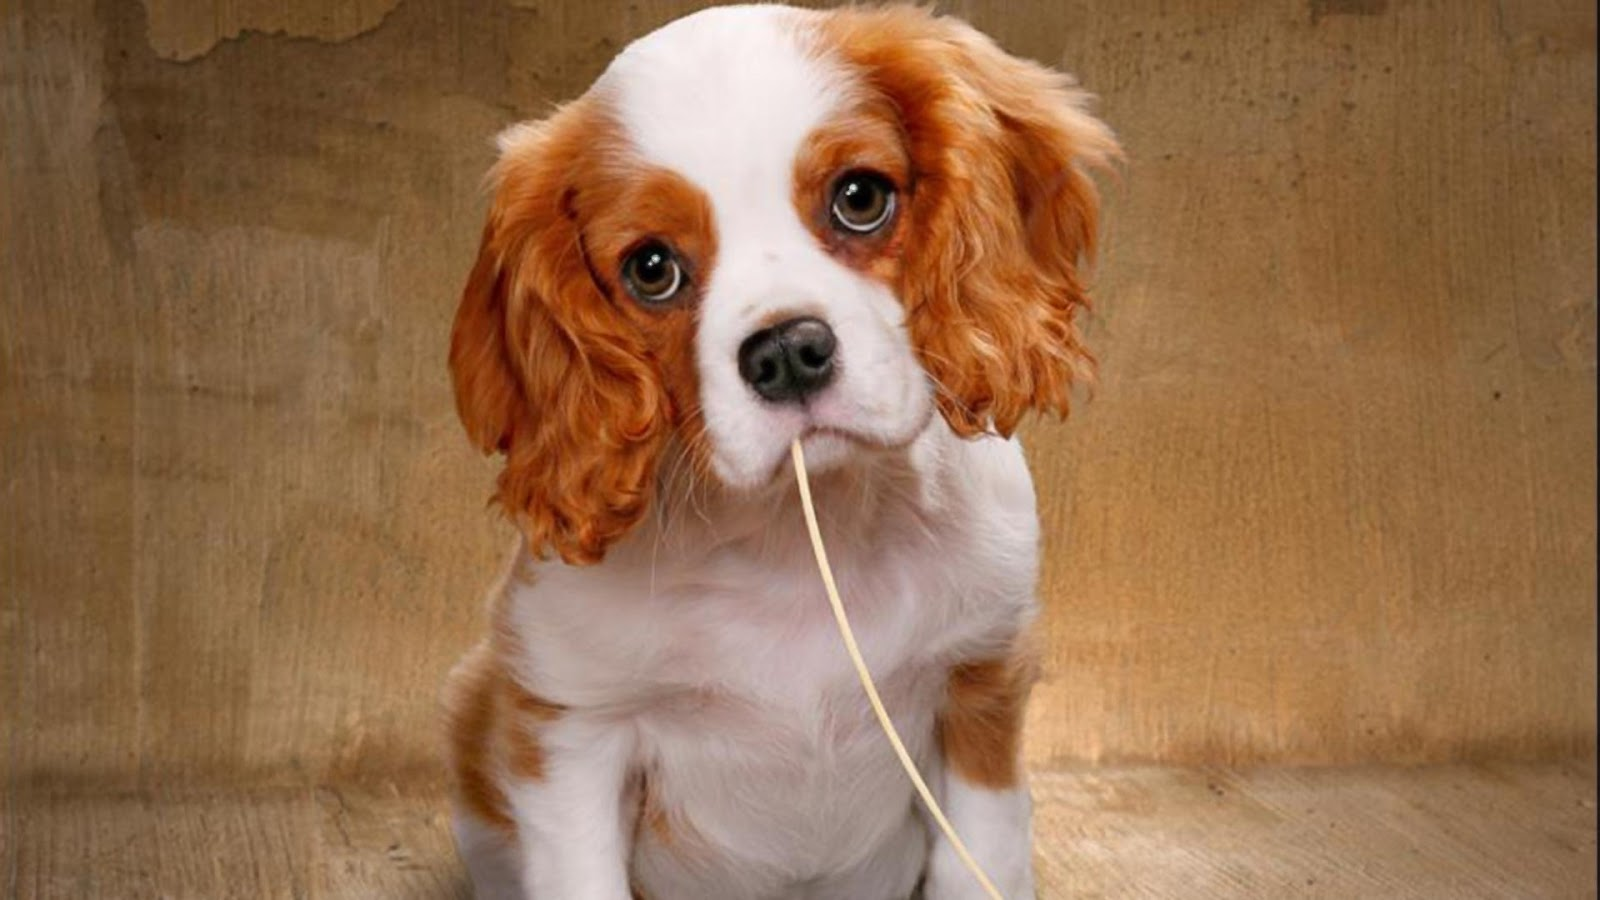 Fondos De Pantalla De Animales Bebes: Fondo De Pantalla Perros 1920x1080